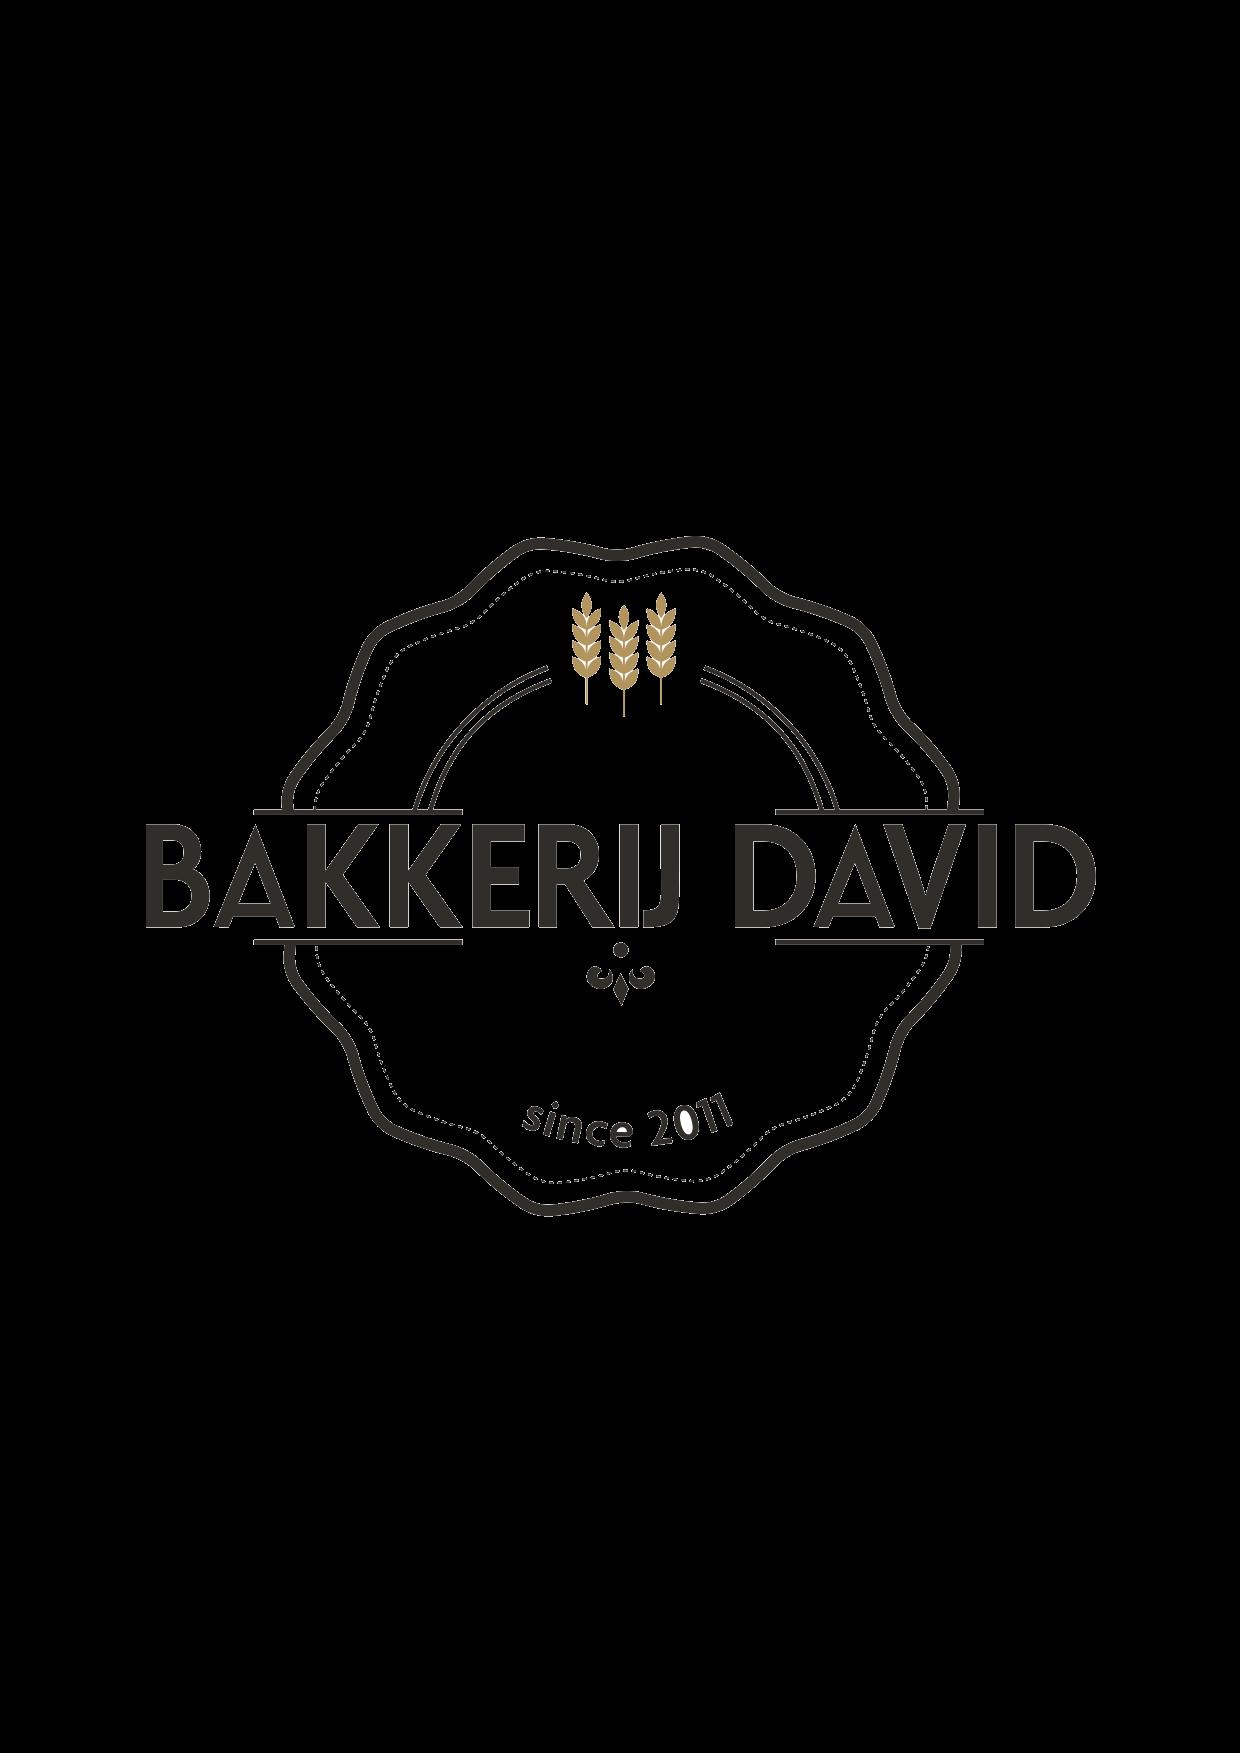 Bakkerij David